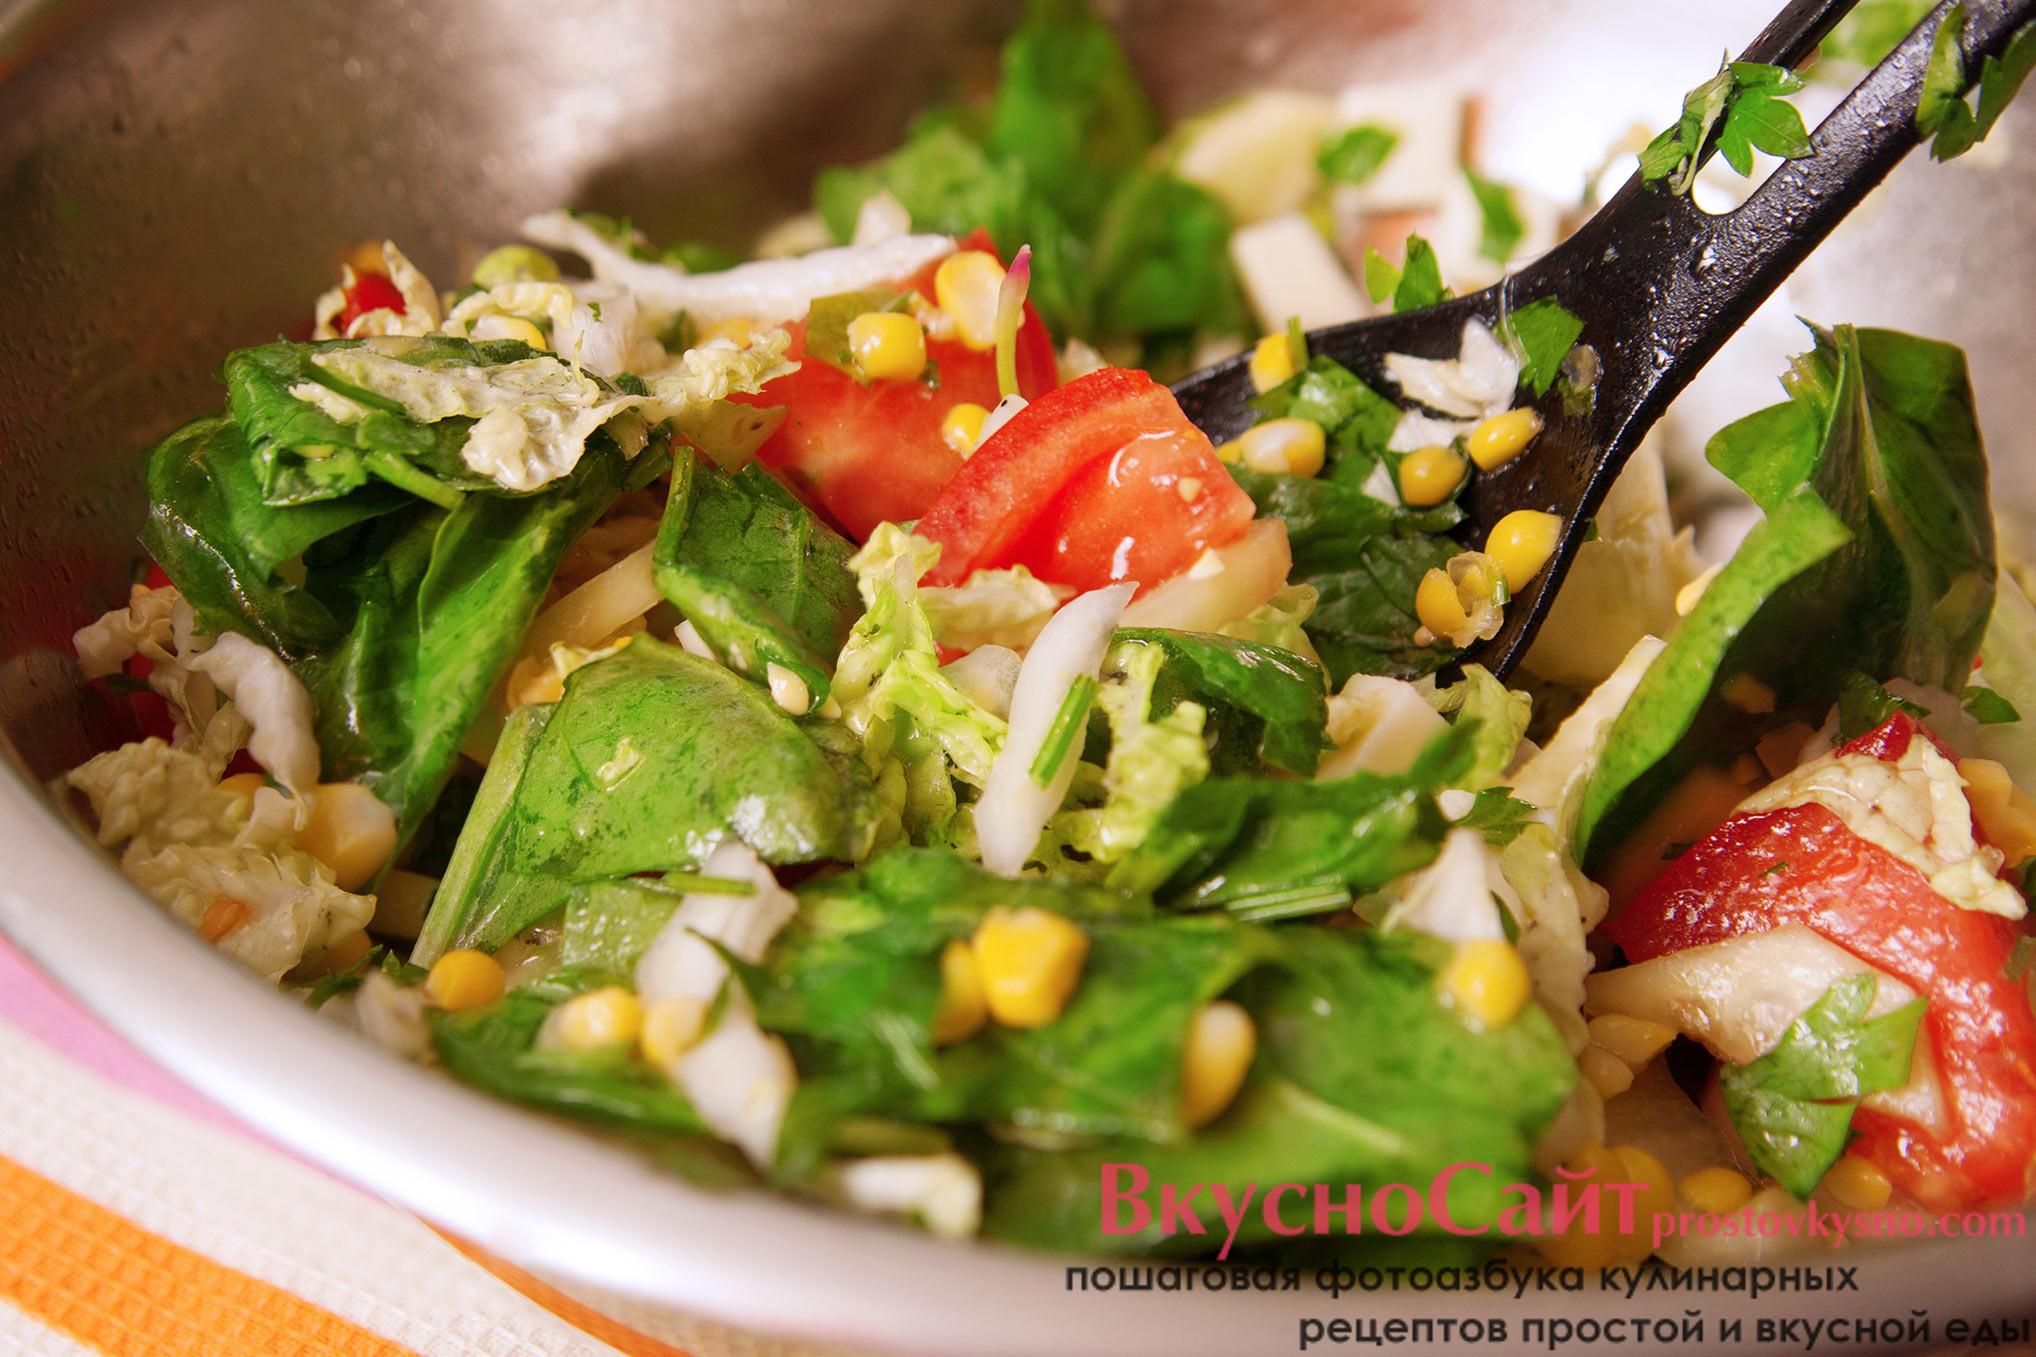 салат с сыром сулугуни и помидорами готов